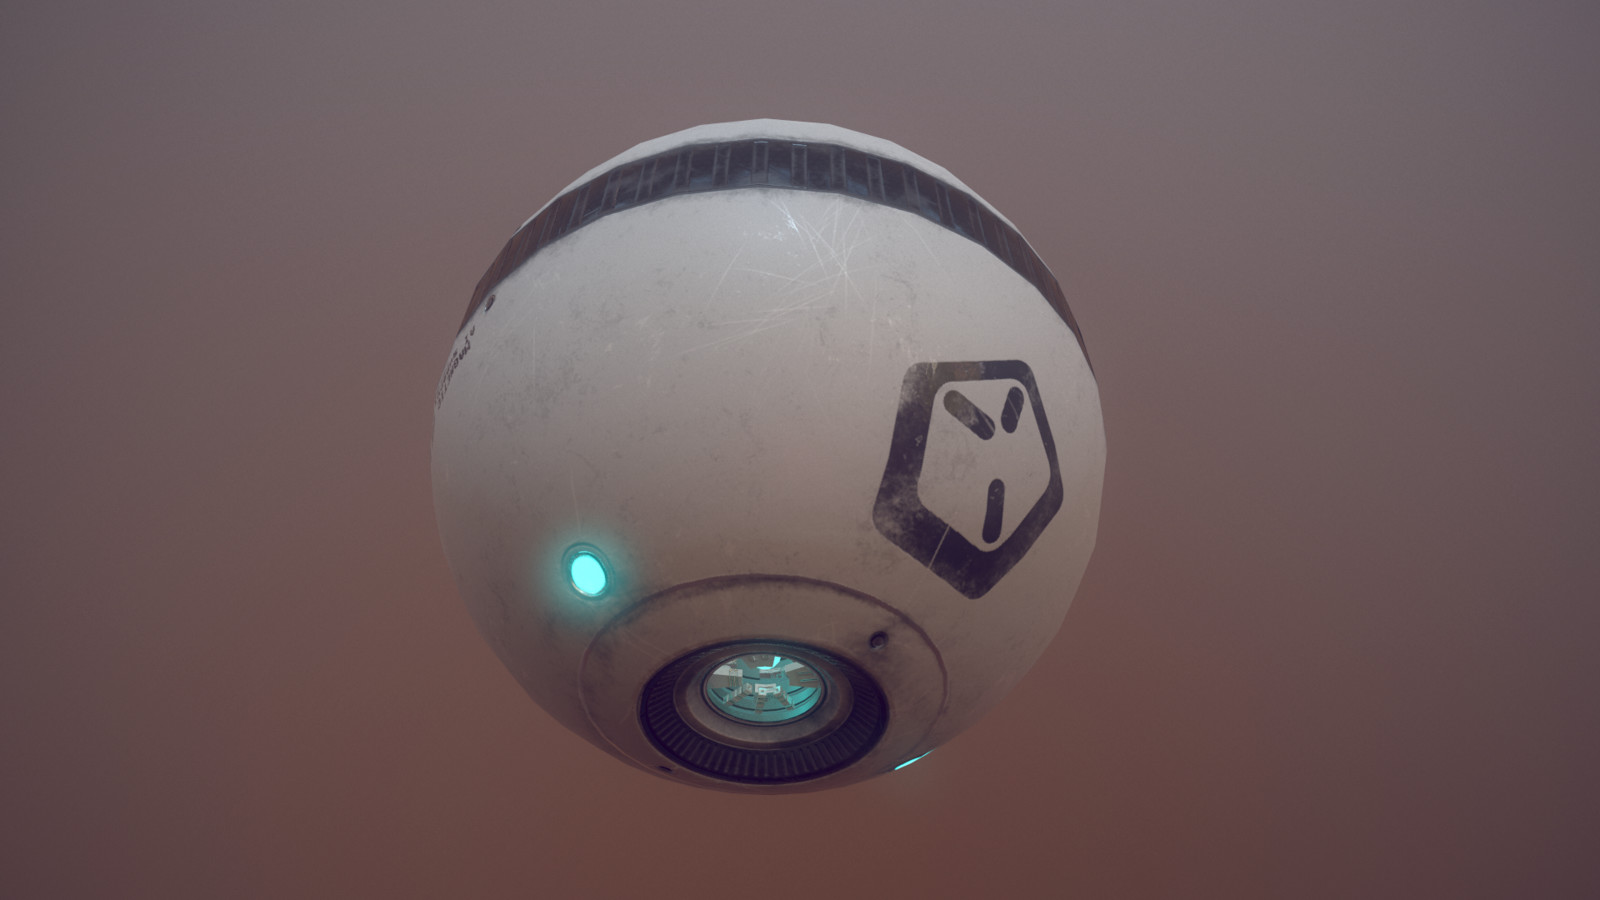 Ball detail view